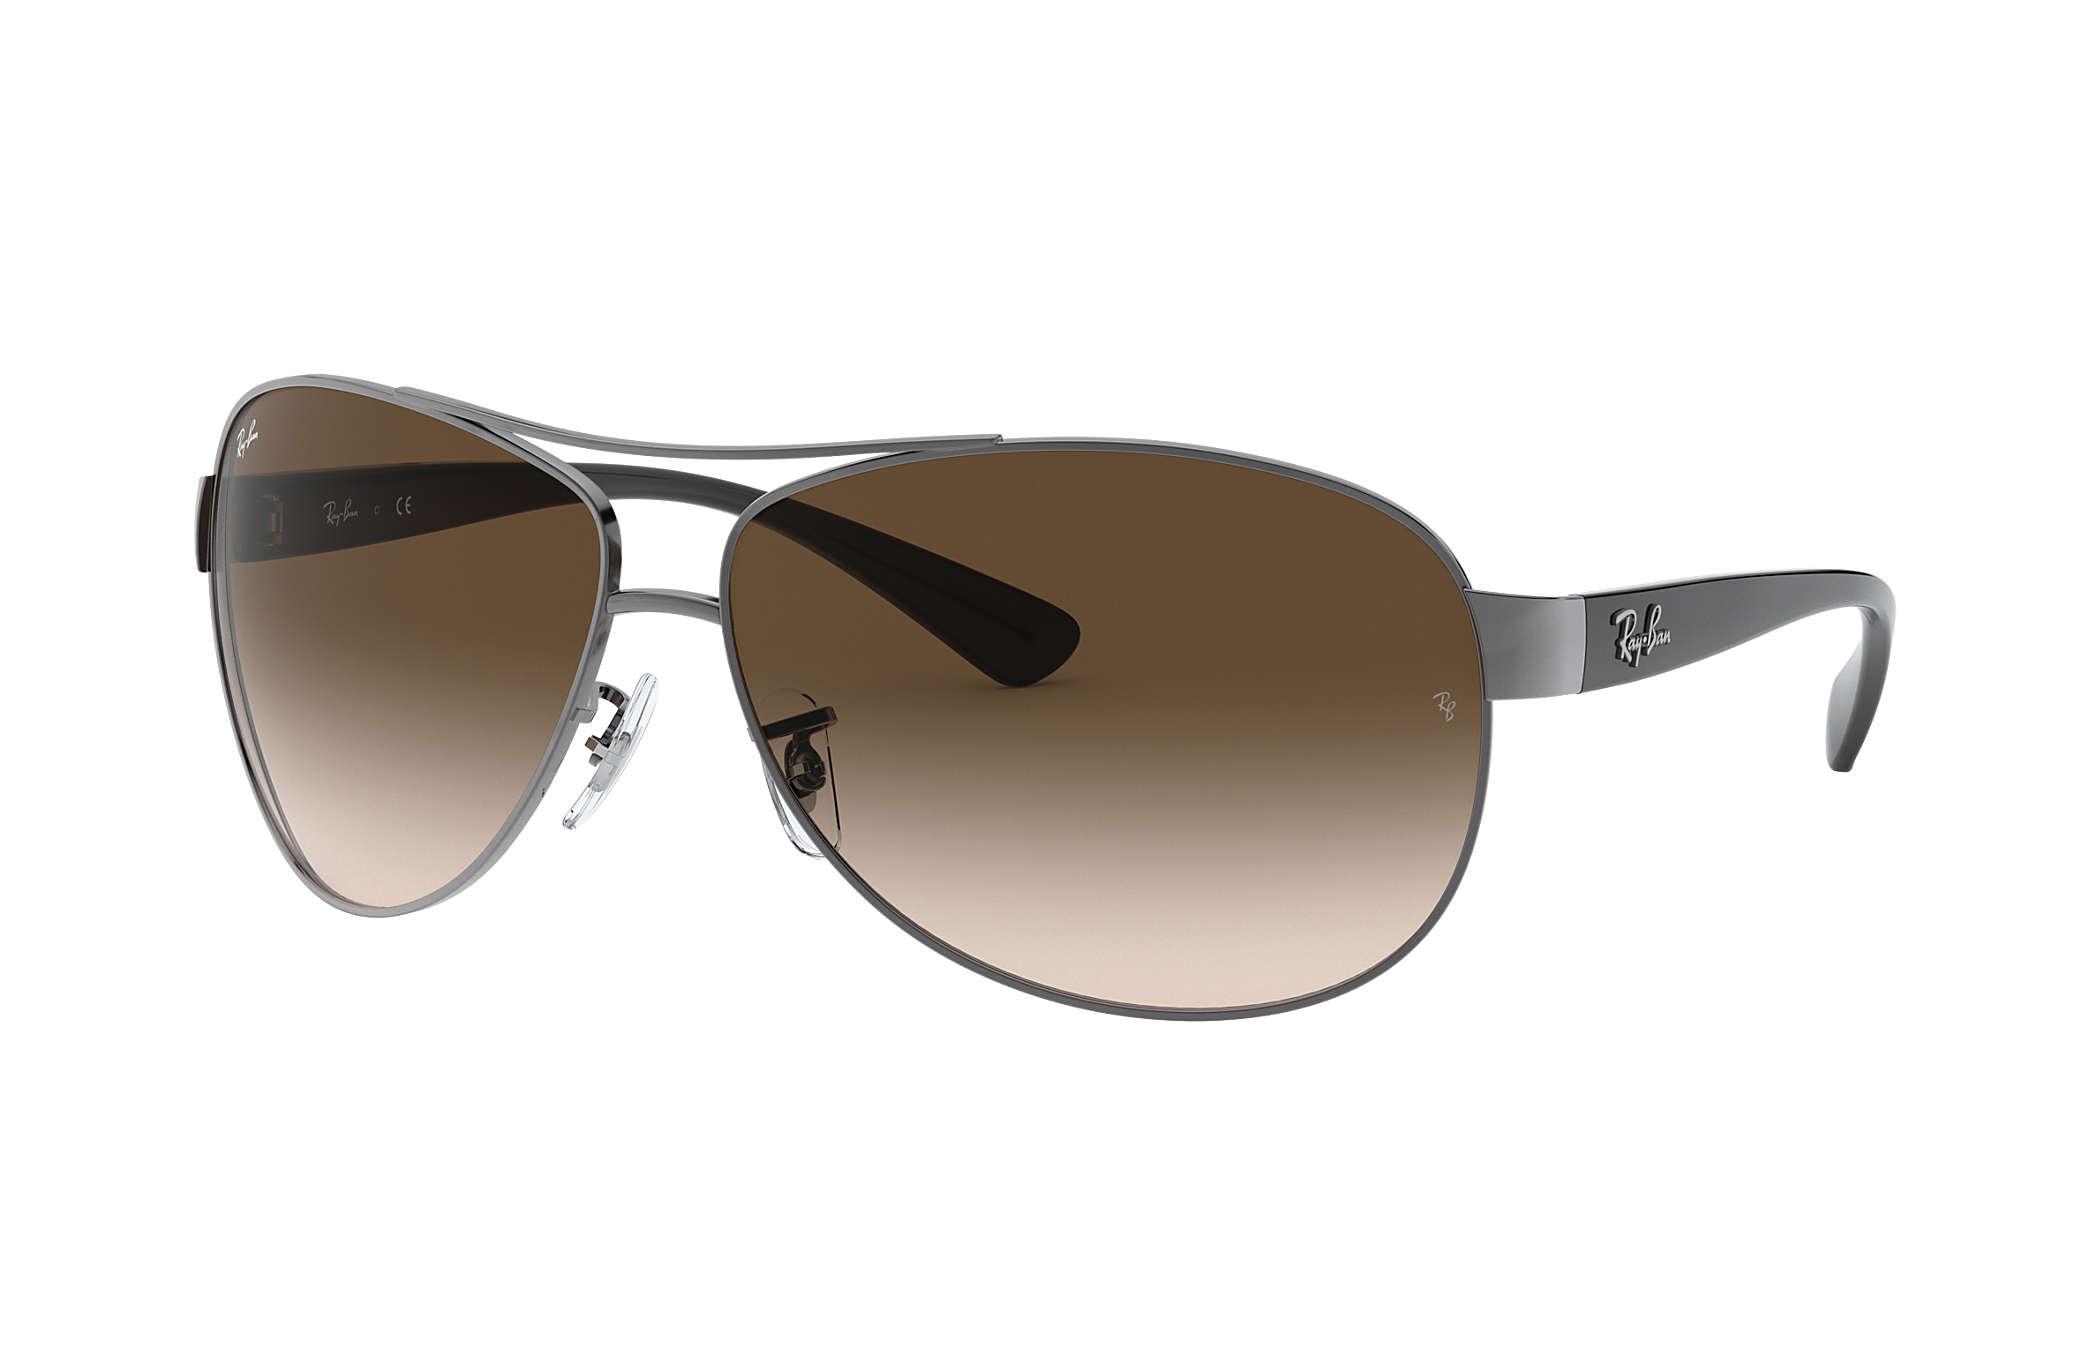 767ae42289e Ray Ban 3386 67 Mm. New RAY BAN Sunglasses Gunmetal ...